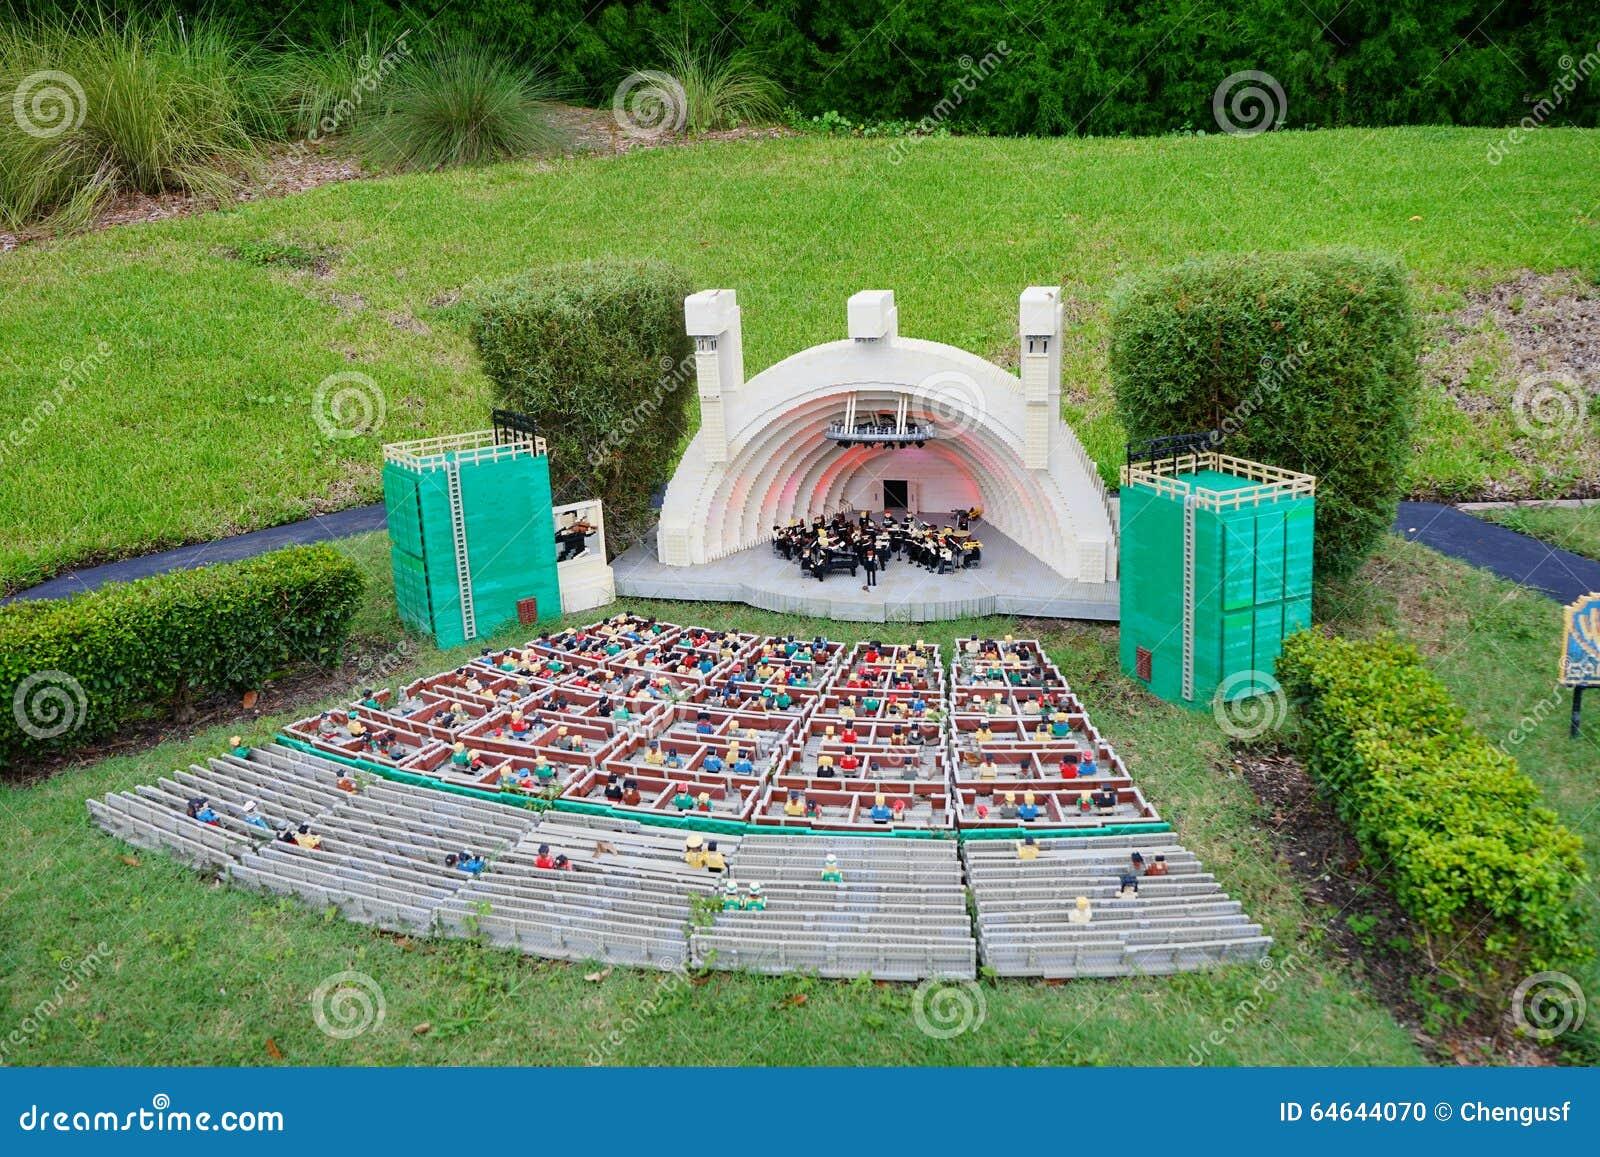 Legoland Florida Miniland USA